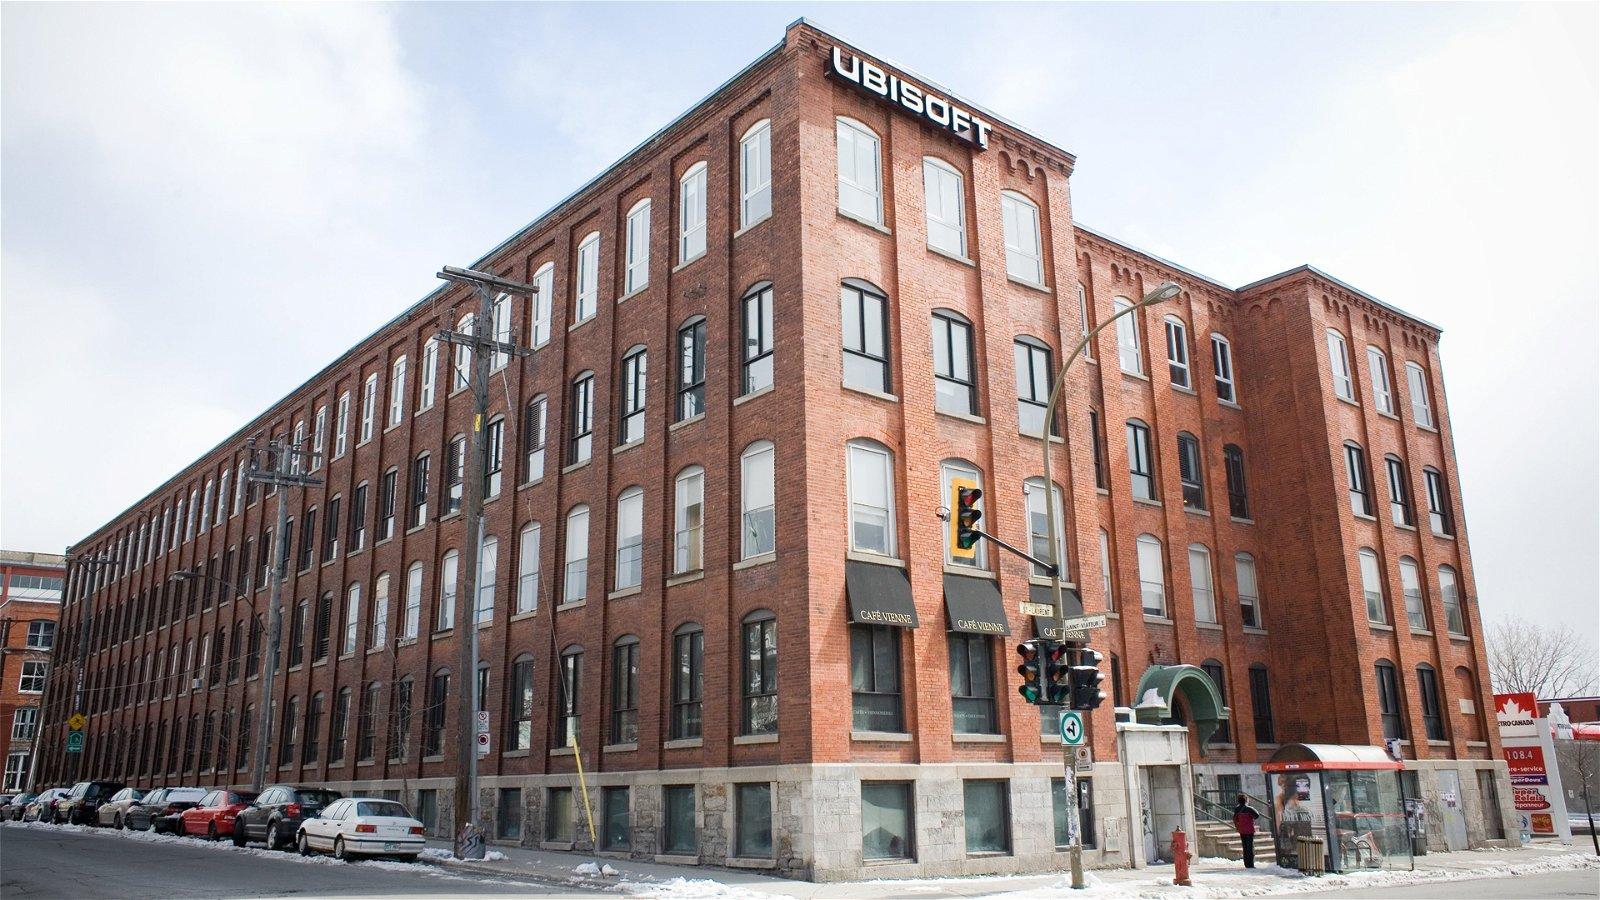 Report: Ubisoft Seeking Investors to Fend Off Takeover Bid 1